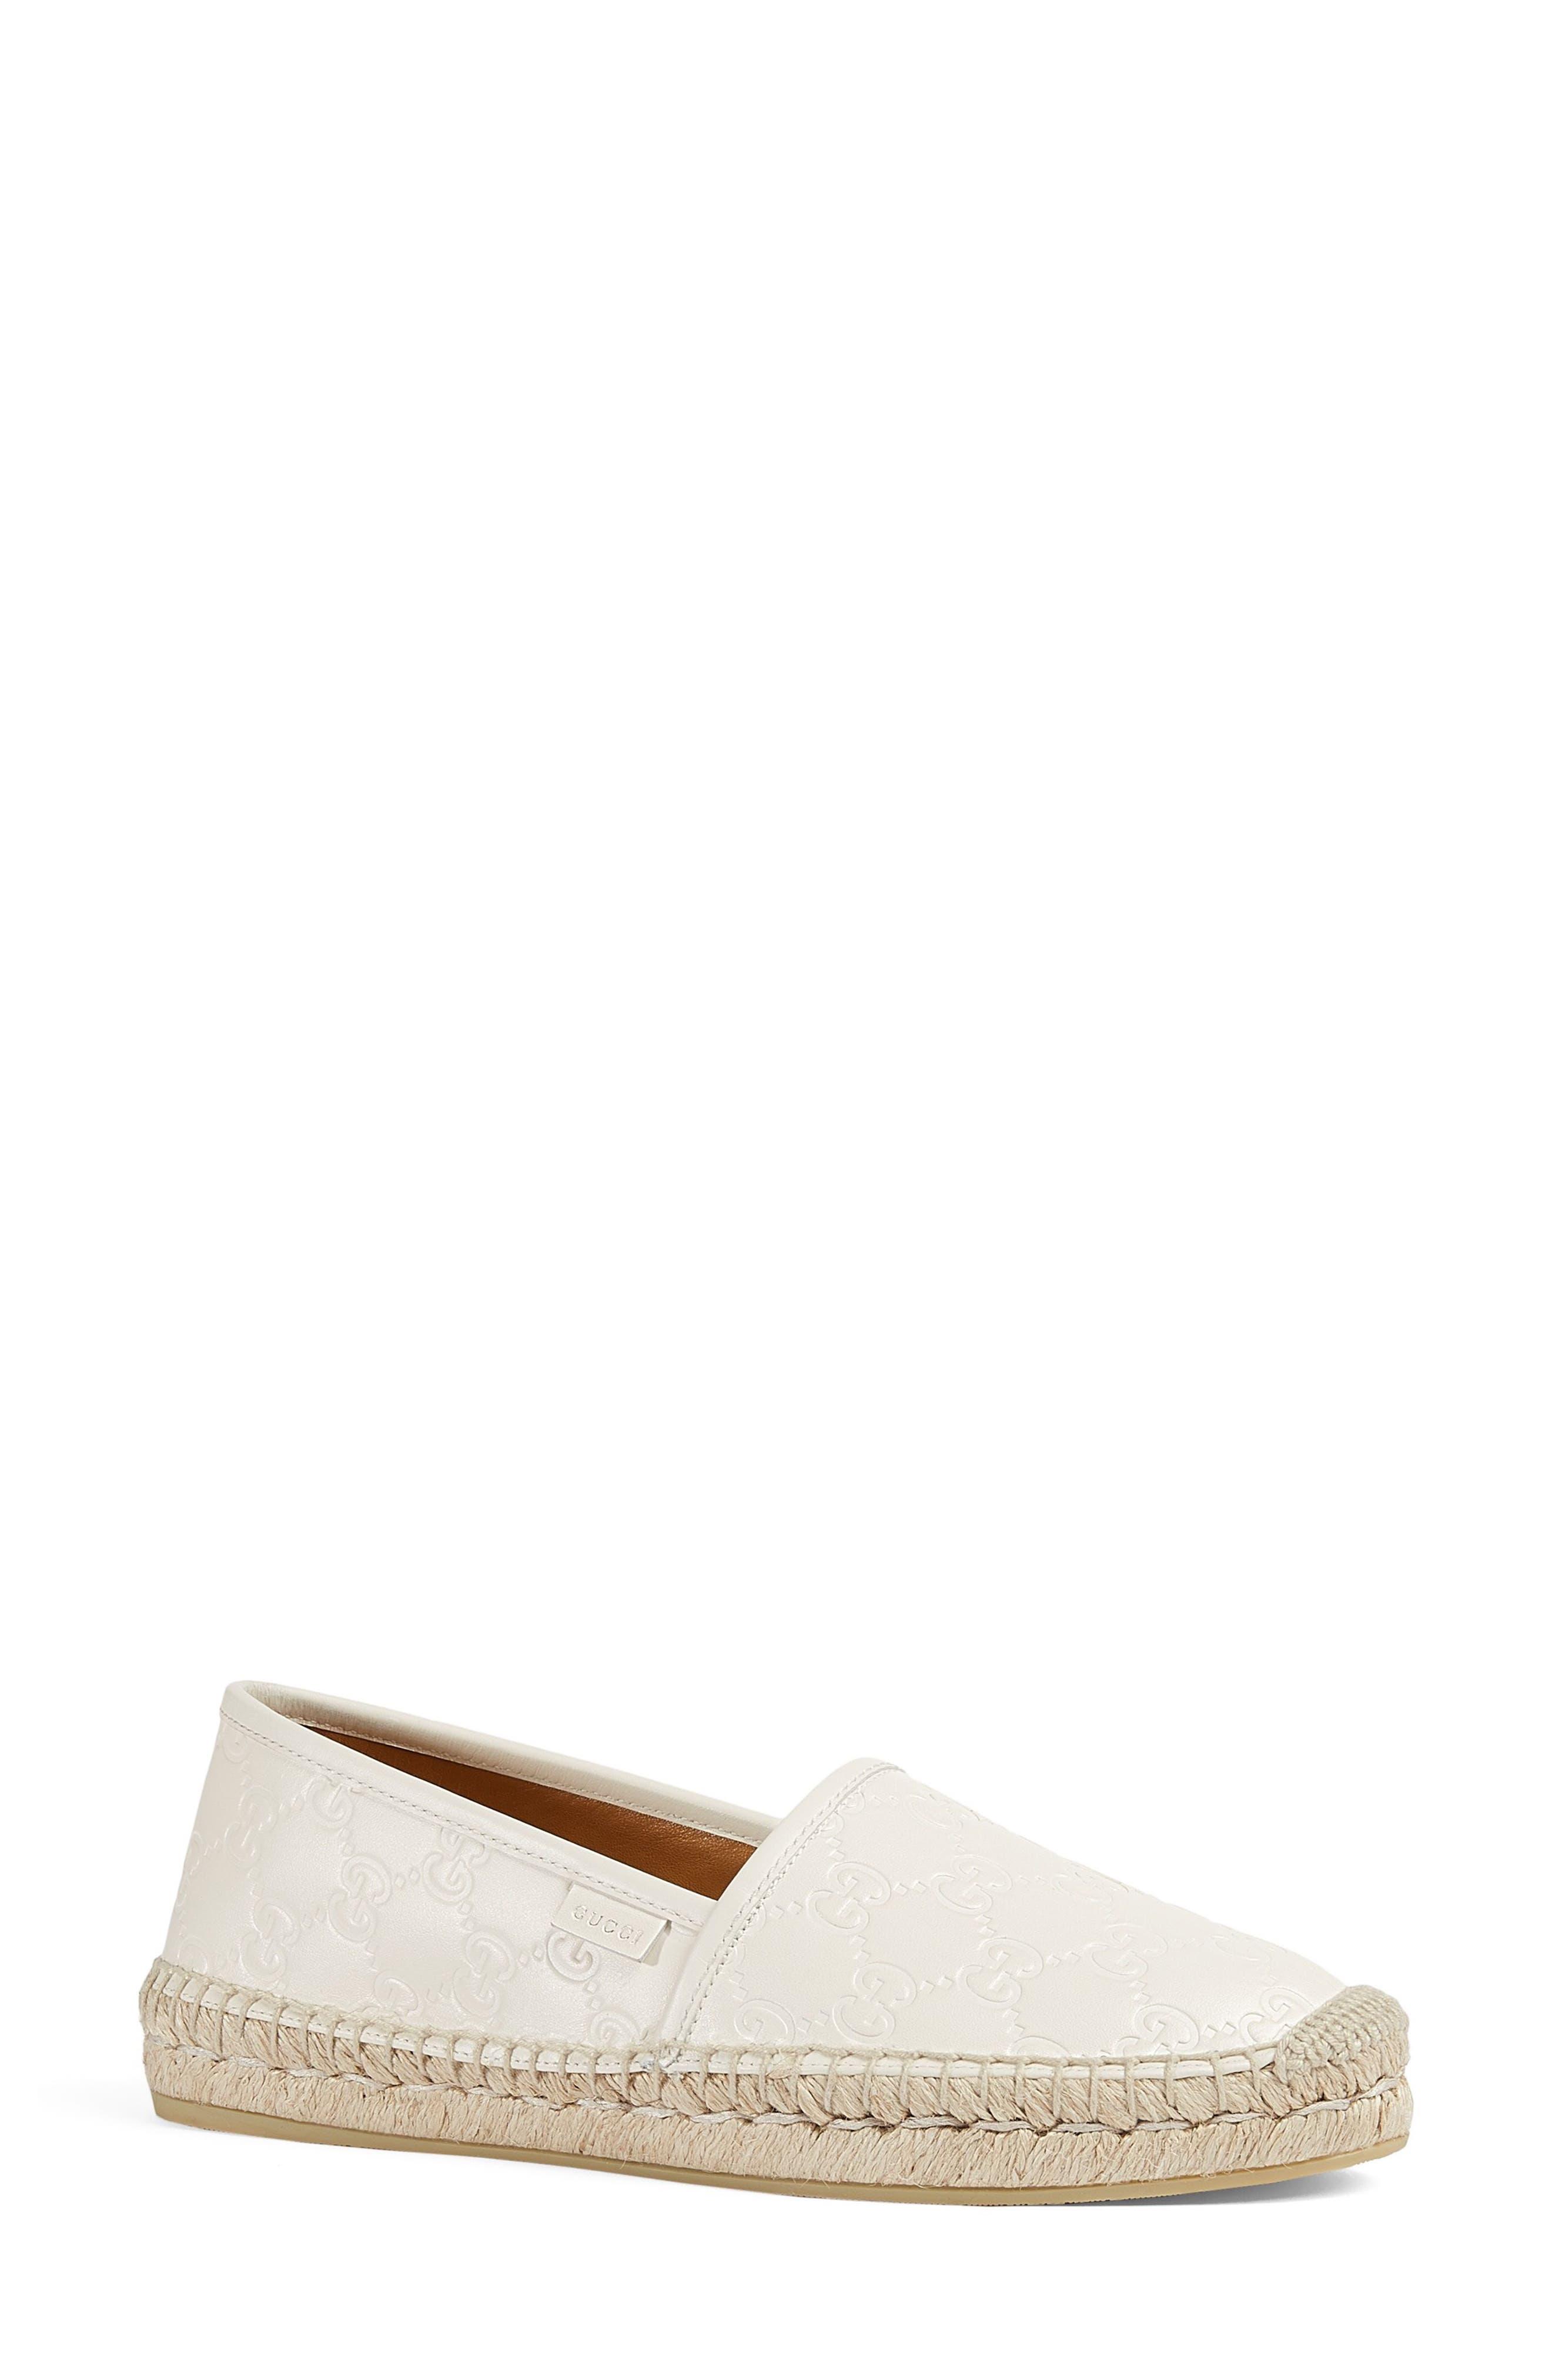 Pilar Espadrille Flat,                             Alternate thumbnail 3, color,                             White Leather